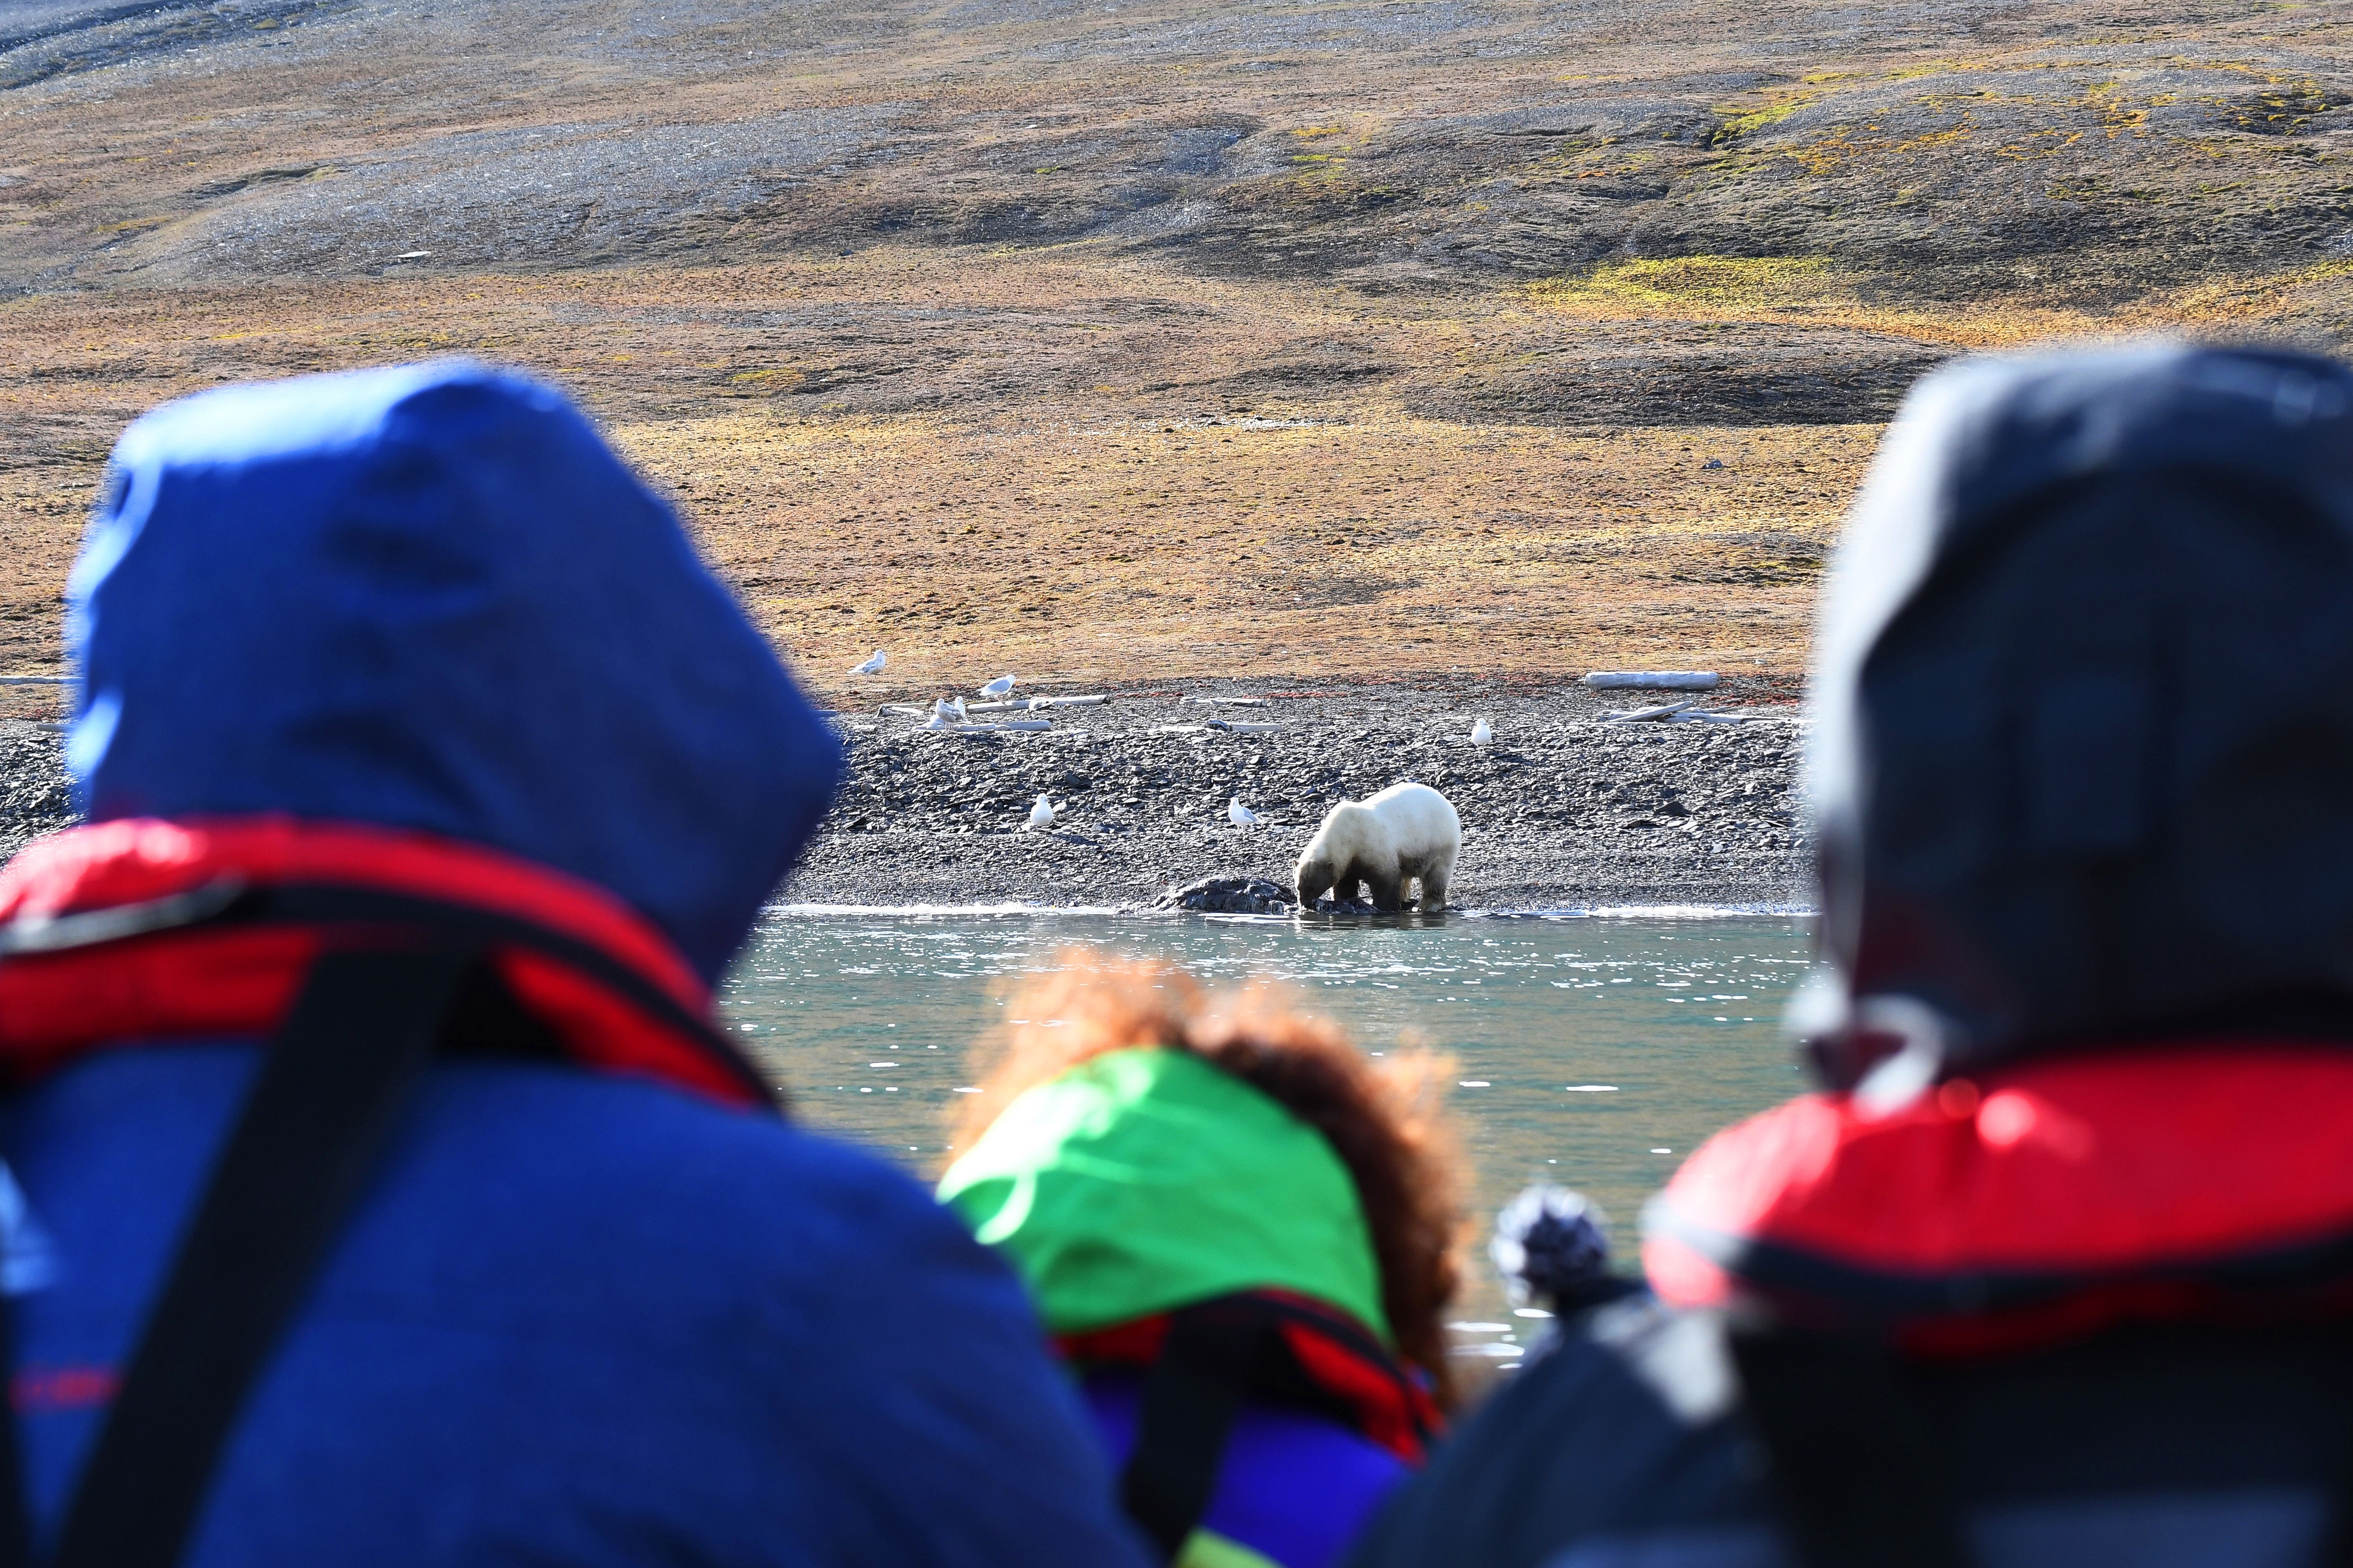 Freemansundet; polar bear; walrus; carcas; Svalbard-aug2017-Geert_Kroes-039.jpg